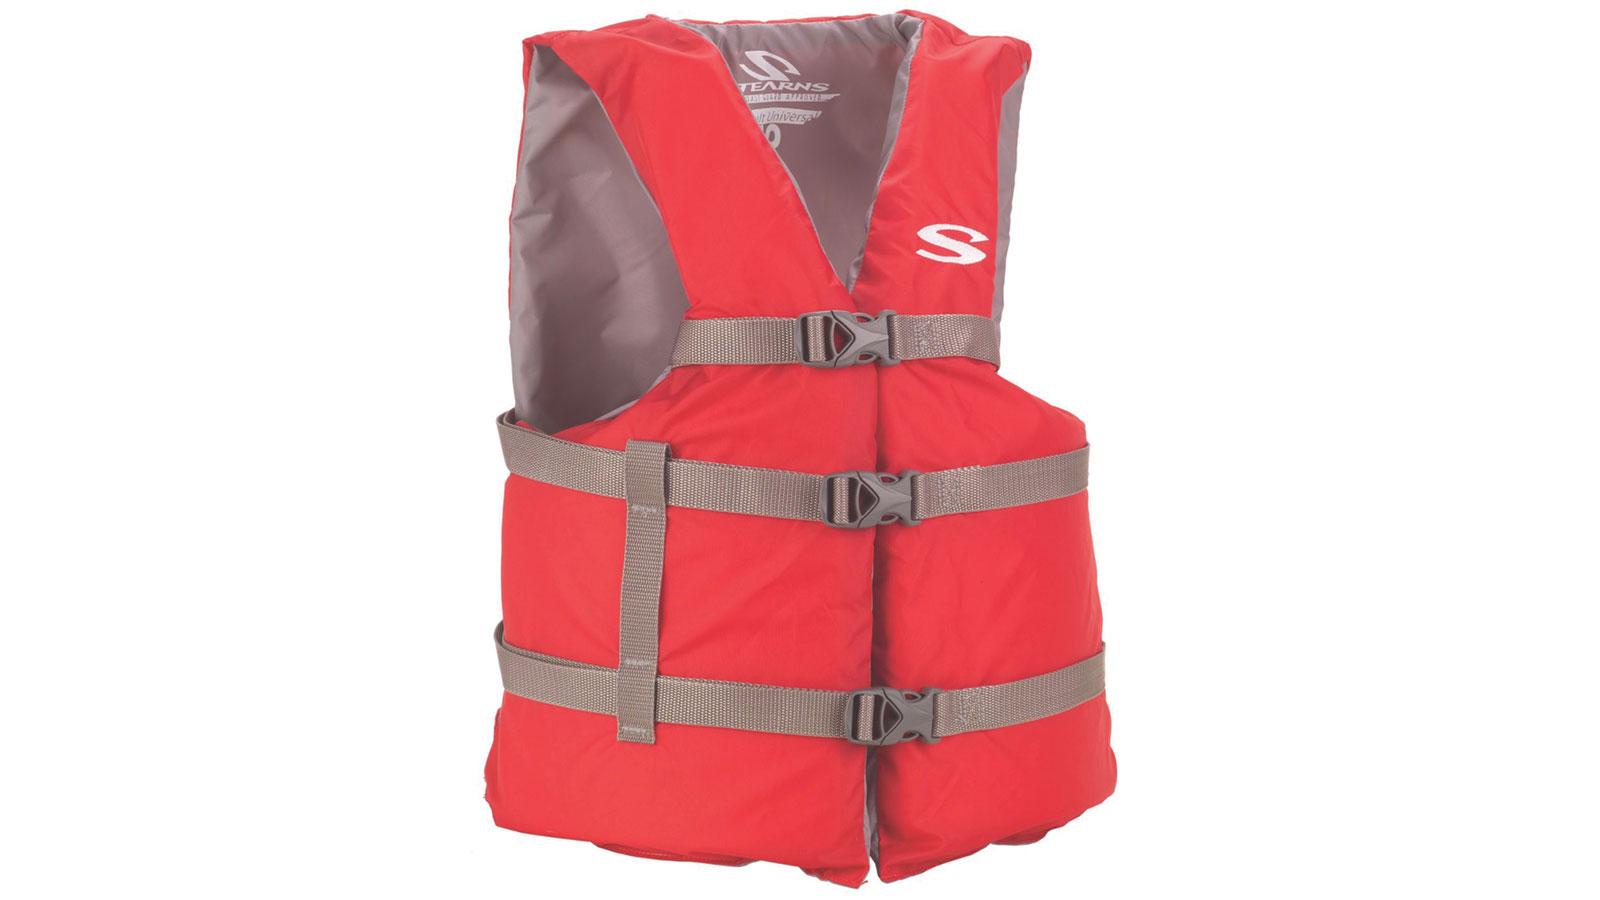 Stearns 3000004474 Adult General Purpose Vest Standard Red